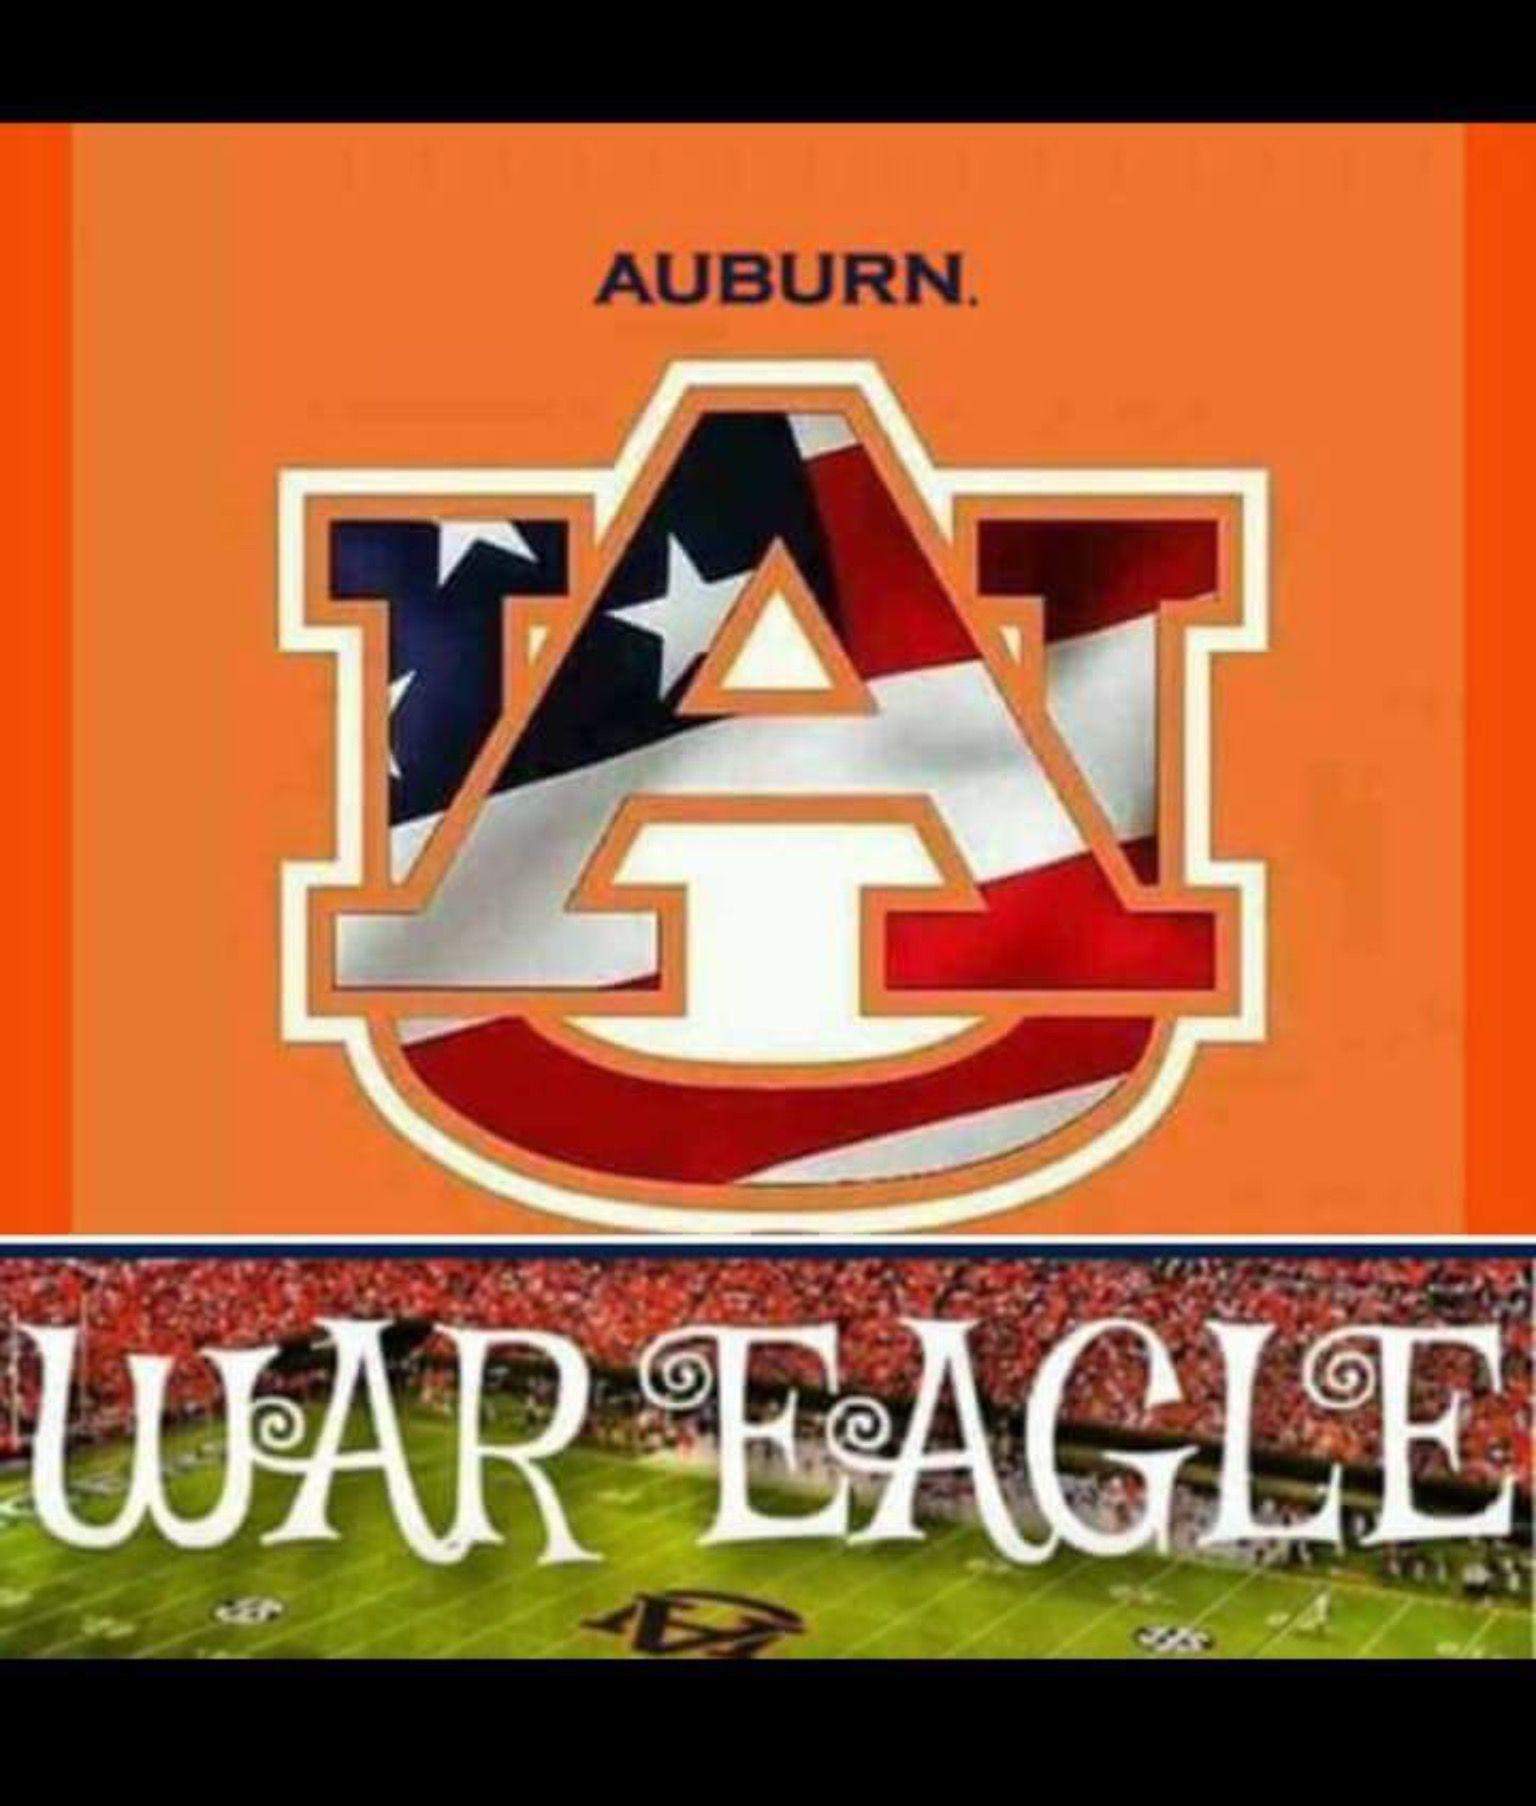 Pin by Pat Brogden on MY AUBURN TIGERS Auburn tigers